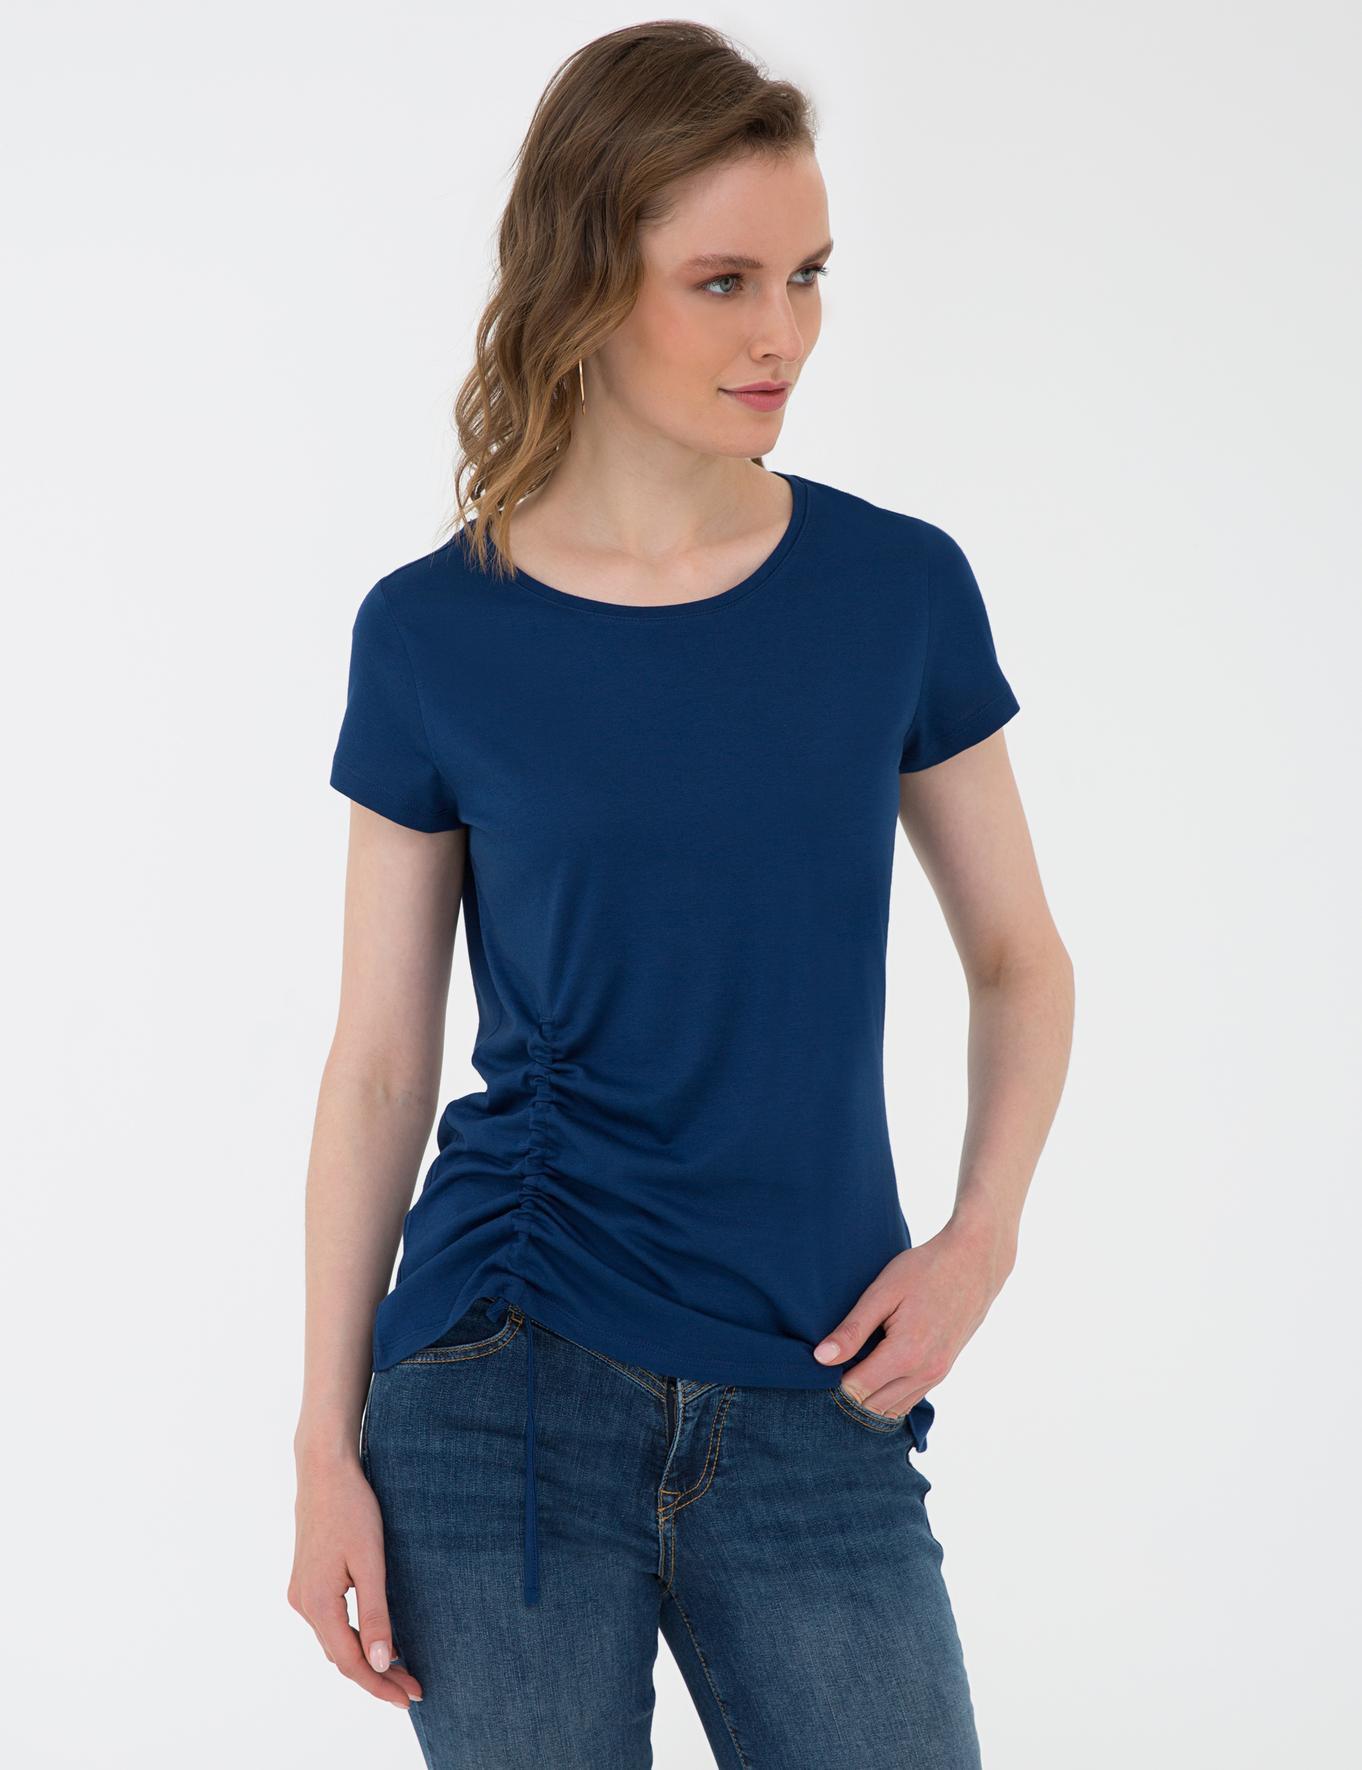 Lacivert Standart Fit Bisiklet Yaka T-Shirt